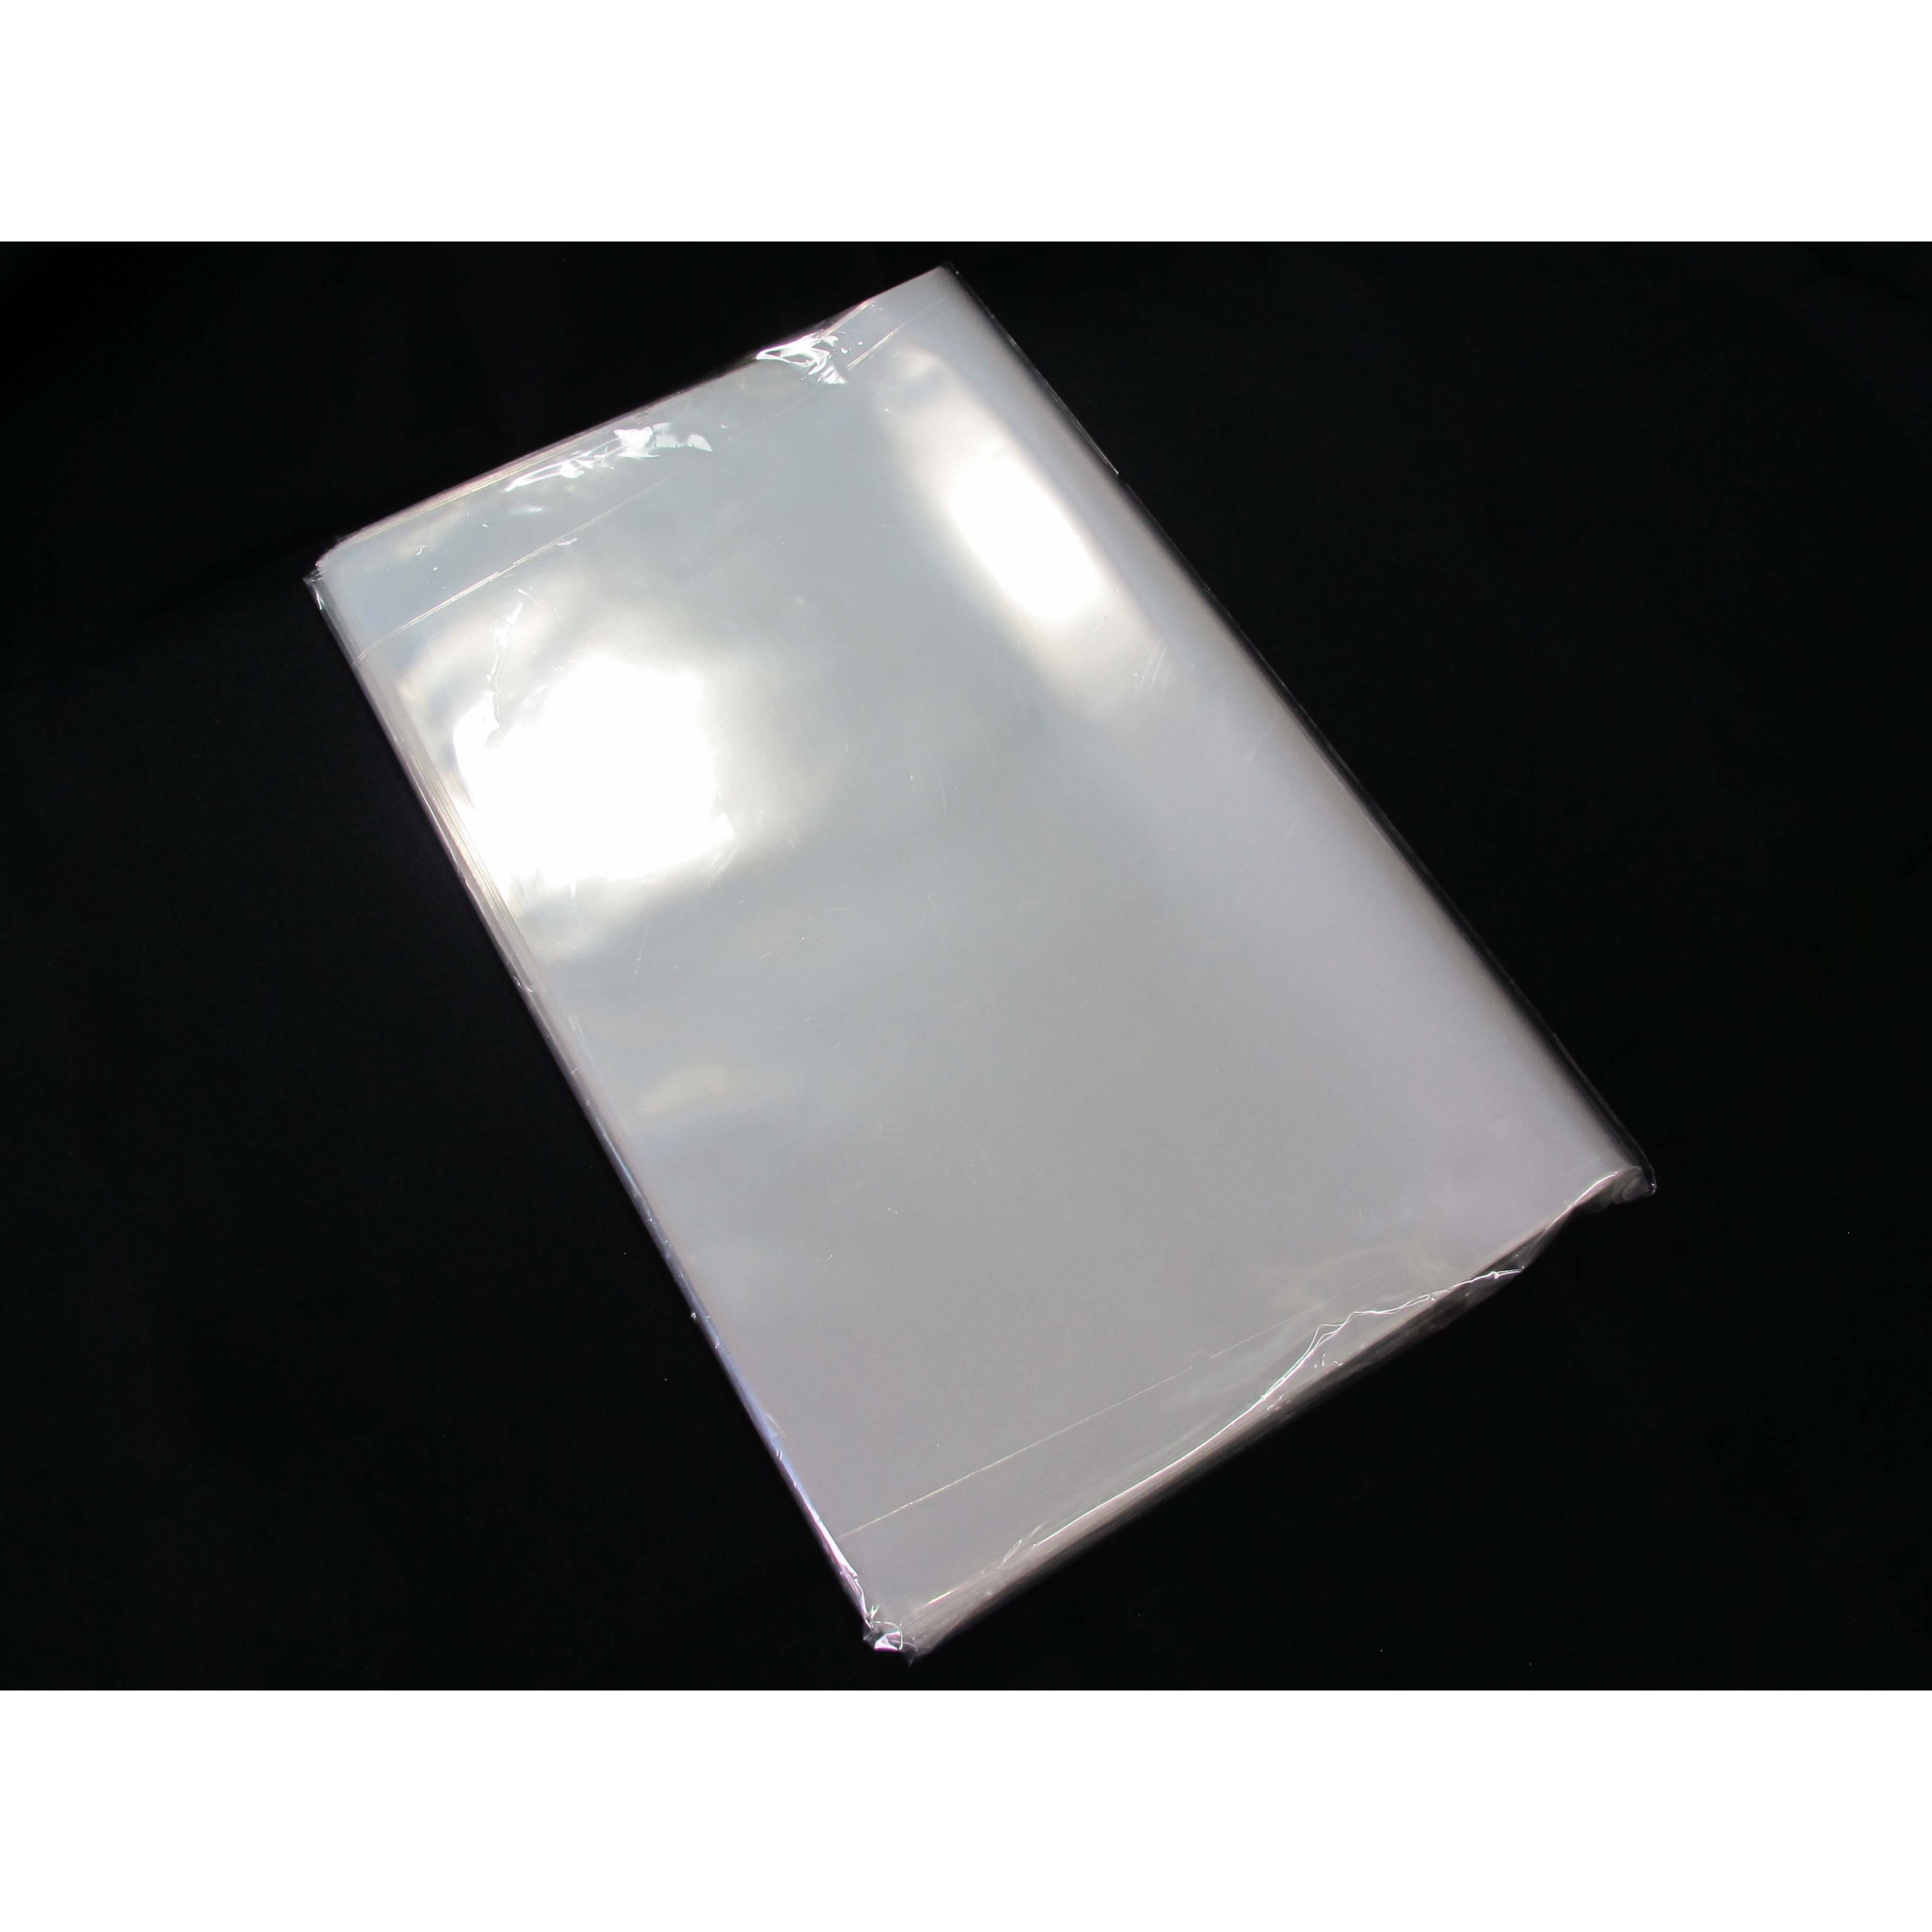 Saco PP Polipropileno 15x20x0,006 Sem Furo - 1kg